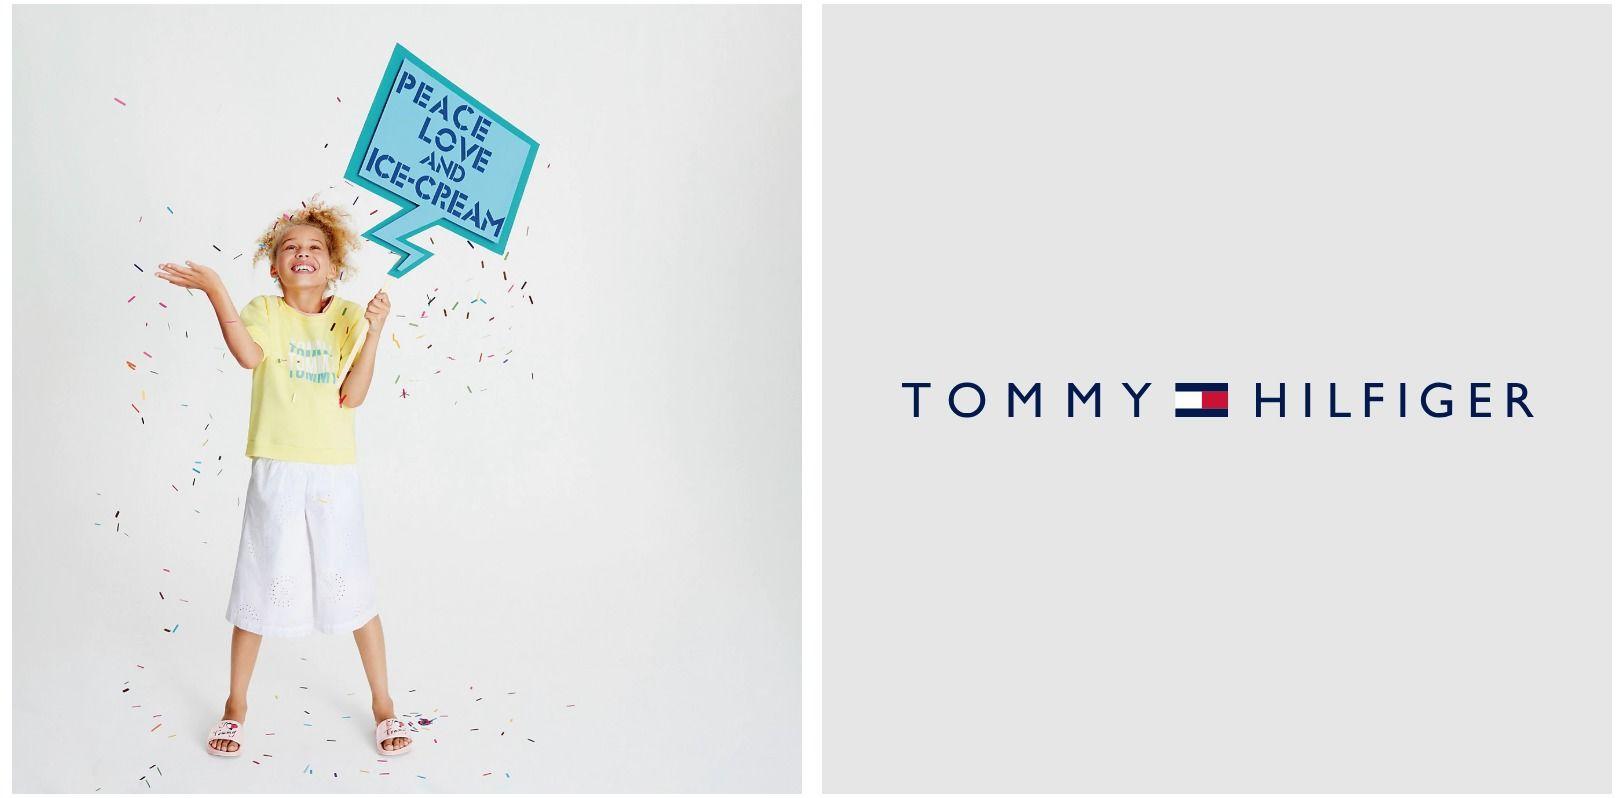 COSMOPOLA | Cris Wiegandt for Tommy Hilfiger